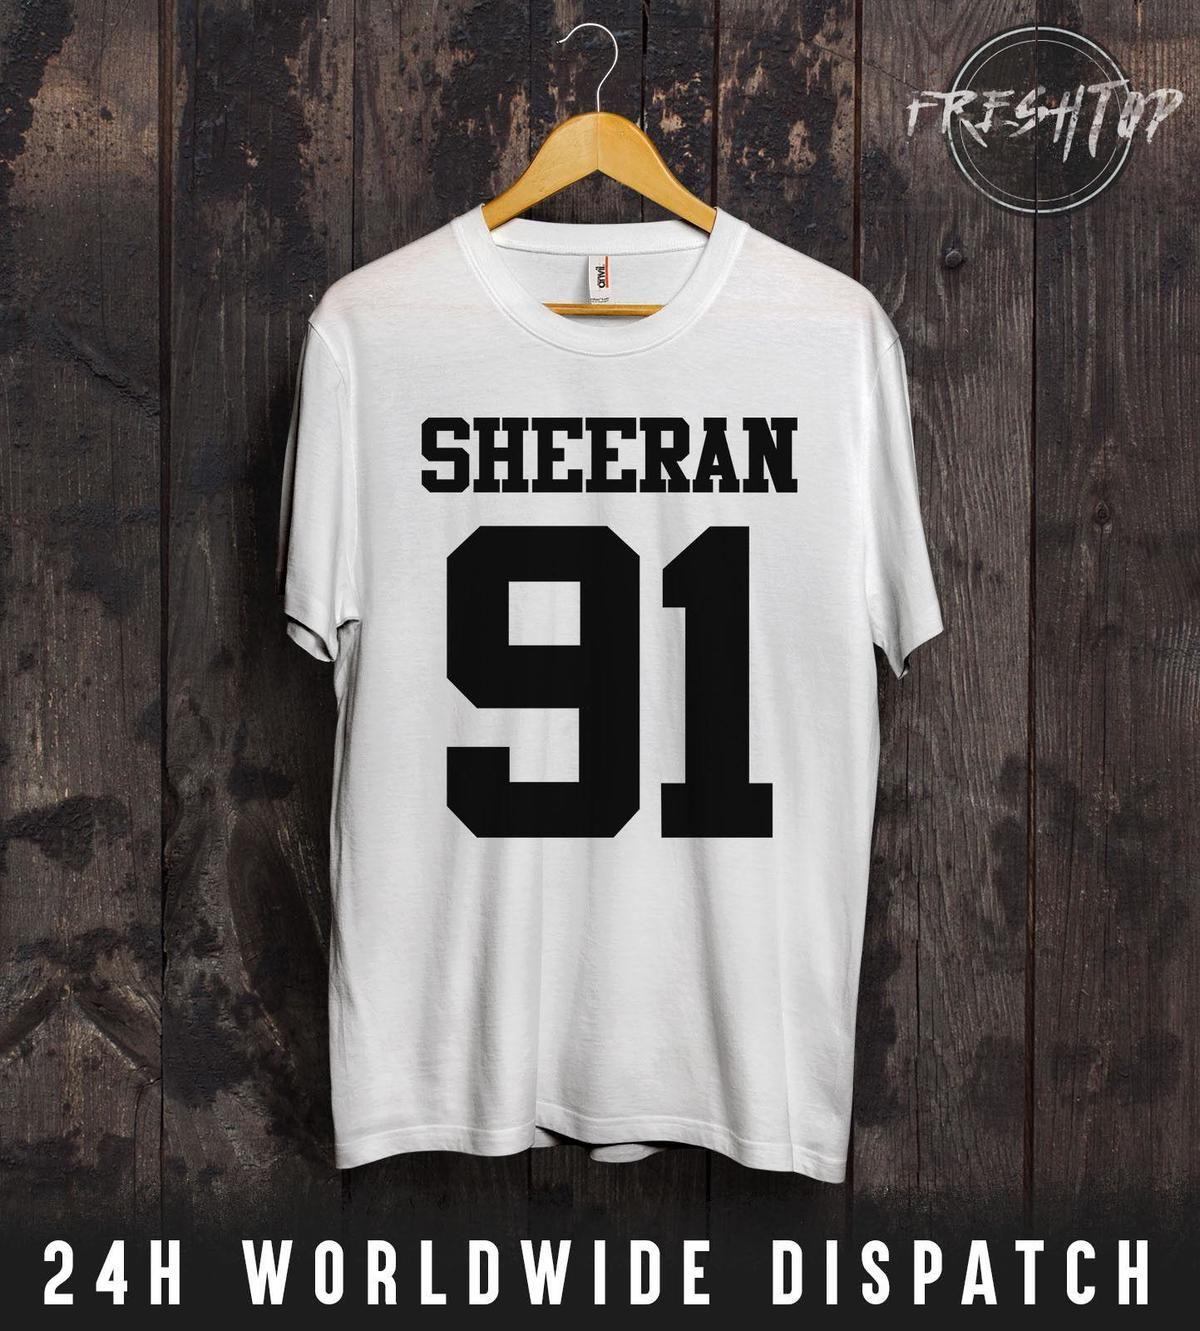 ee32323bb3 Compre Ed Sheeran 91 Camiseta Tumblr OOTD X + ÷ Presente Aniversário  Concerto Festival Música De Lefan05